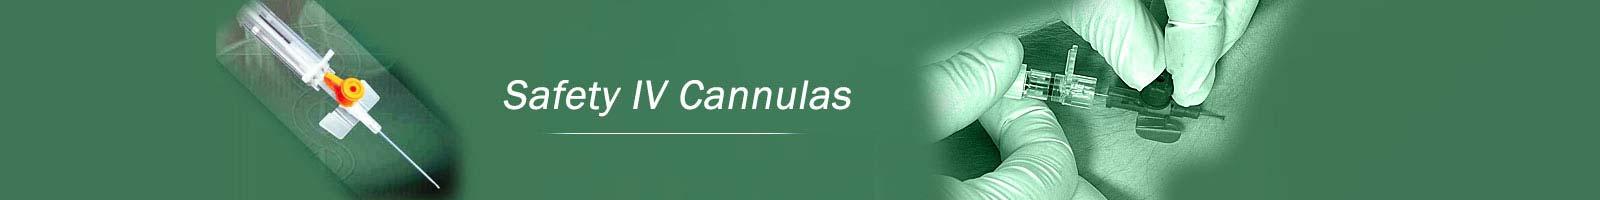 Safety IV Cannulas